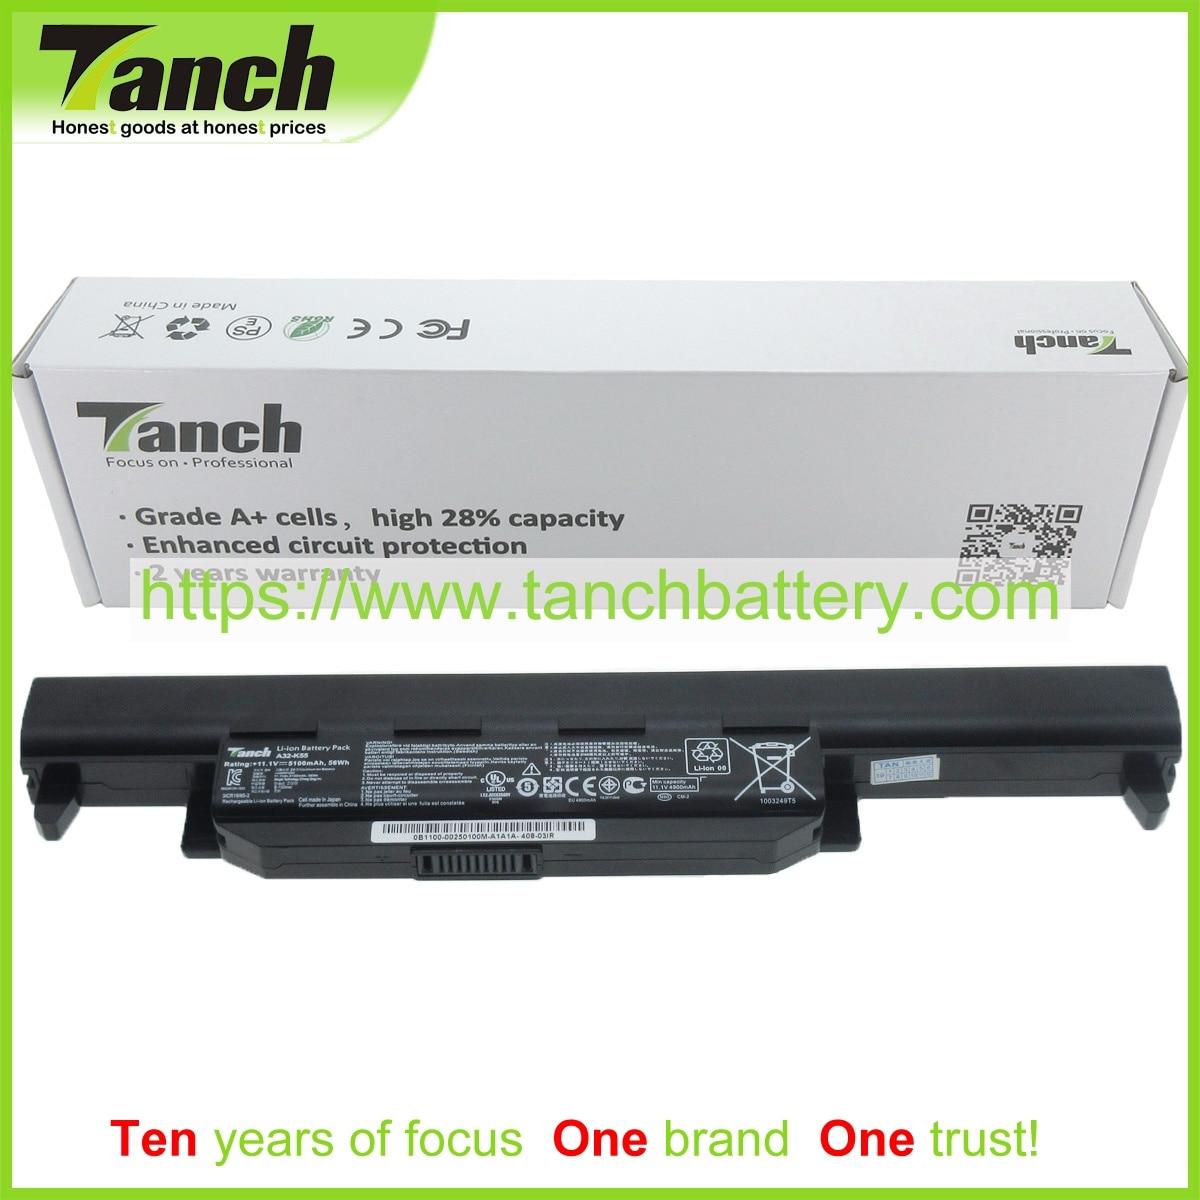 Tanch بطارية كمبيوتر محمول ل ASUS A41-K55 K95VM 0B110-00050400 0B110-00050900 0B110-00050700 0B110-00051100 11.1V 6 خلية